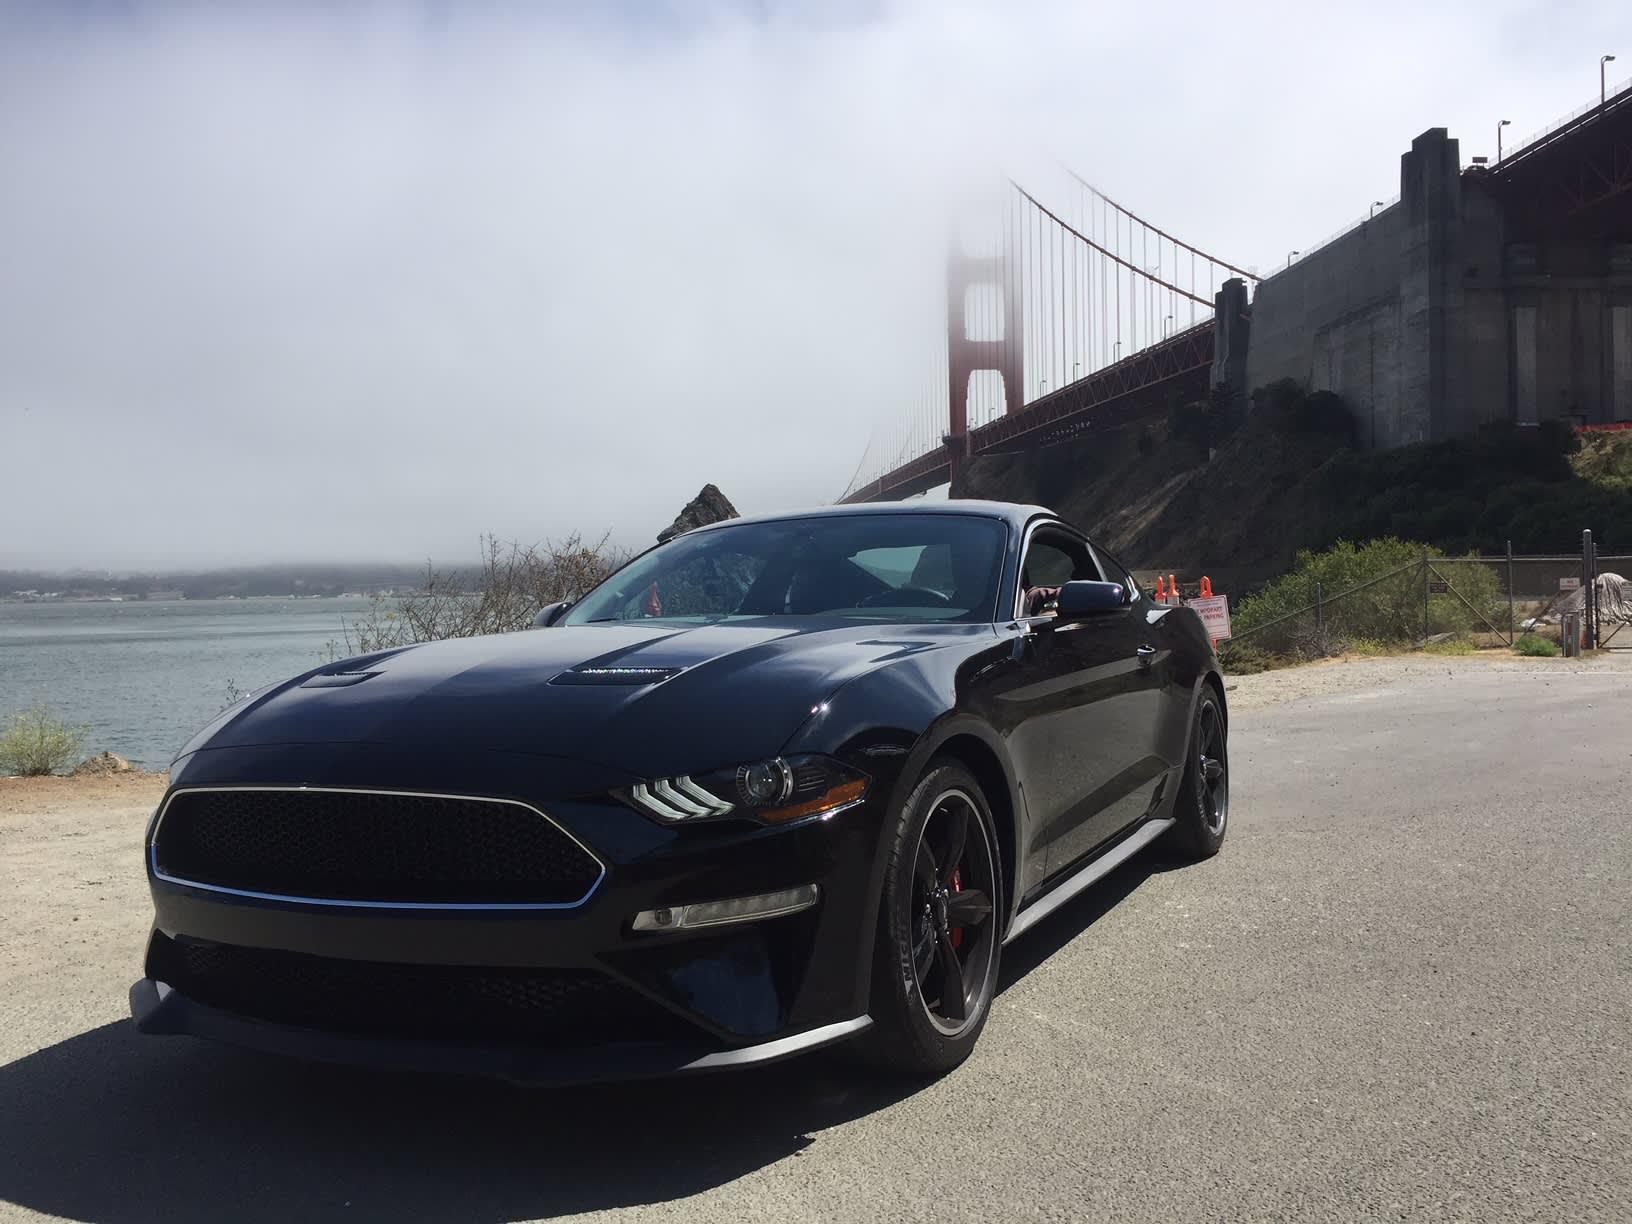 Bullitt Mustang rides again  Can McQueen's car restore shine to Ford?